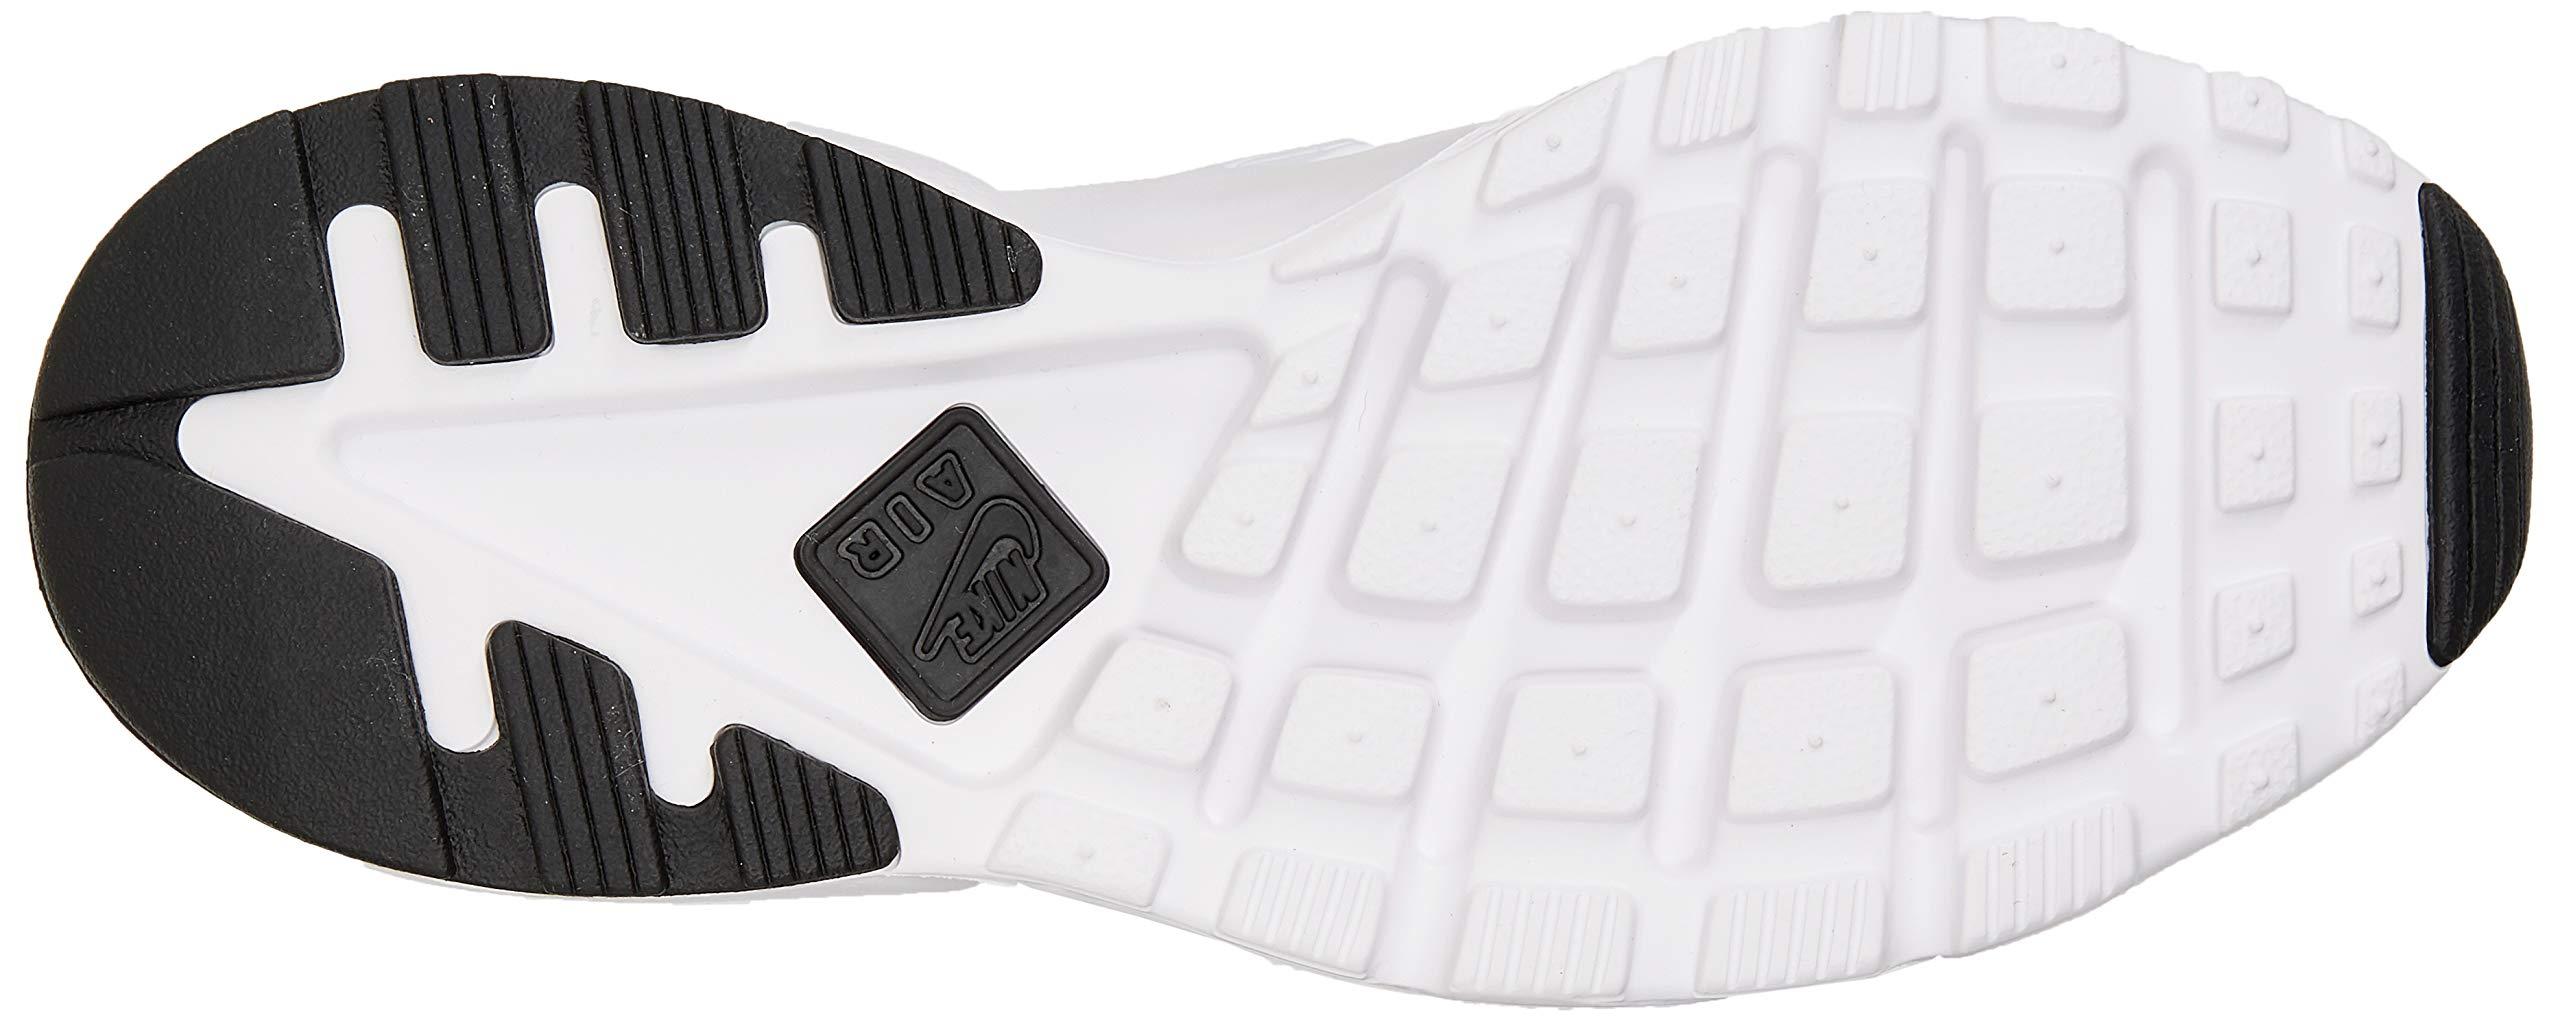 71opgz7tTzL - Nike Men's Air Huarache Run Ultra Se Gymnastics Shoes